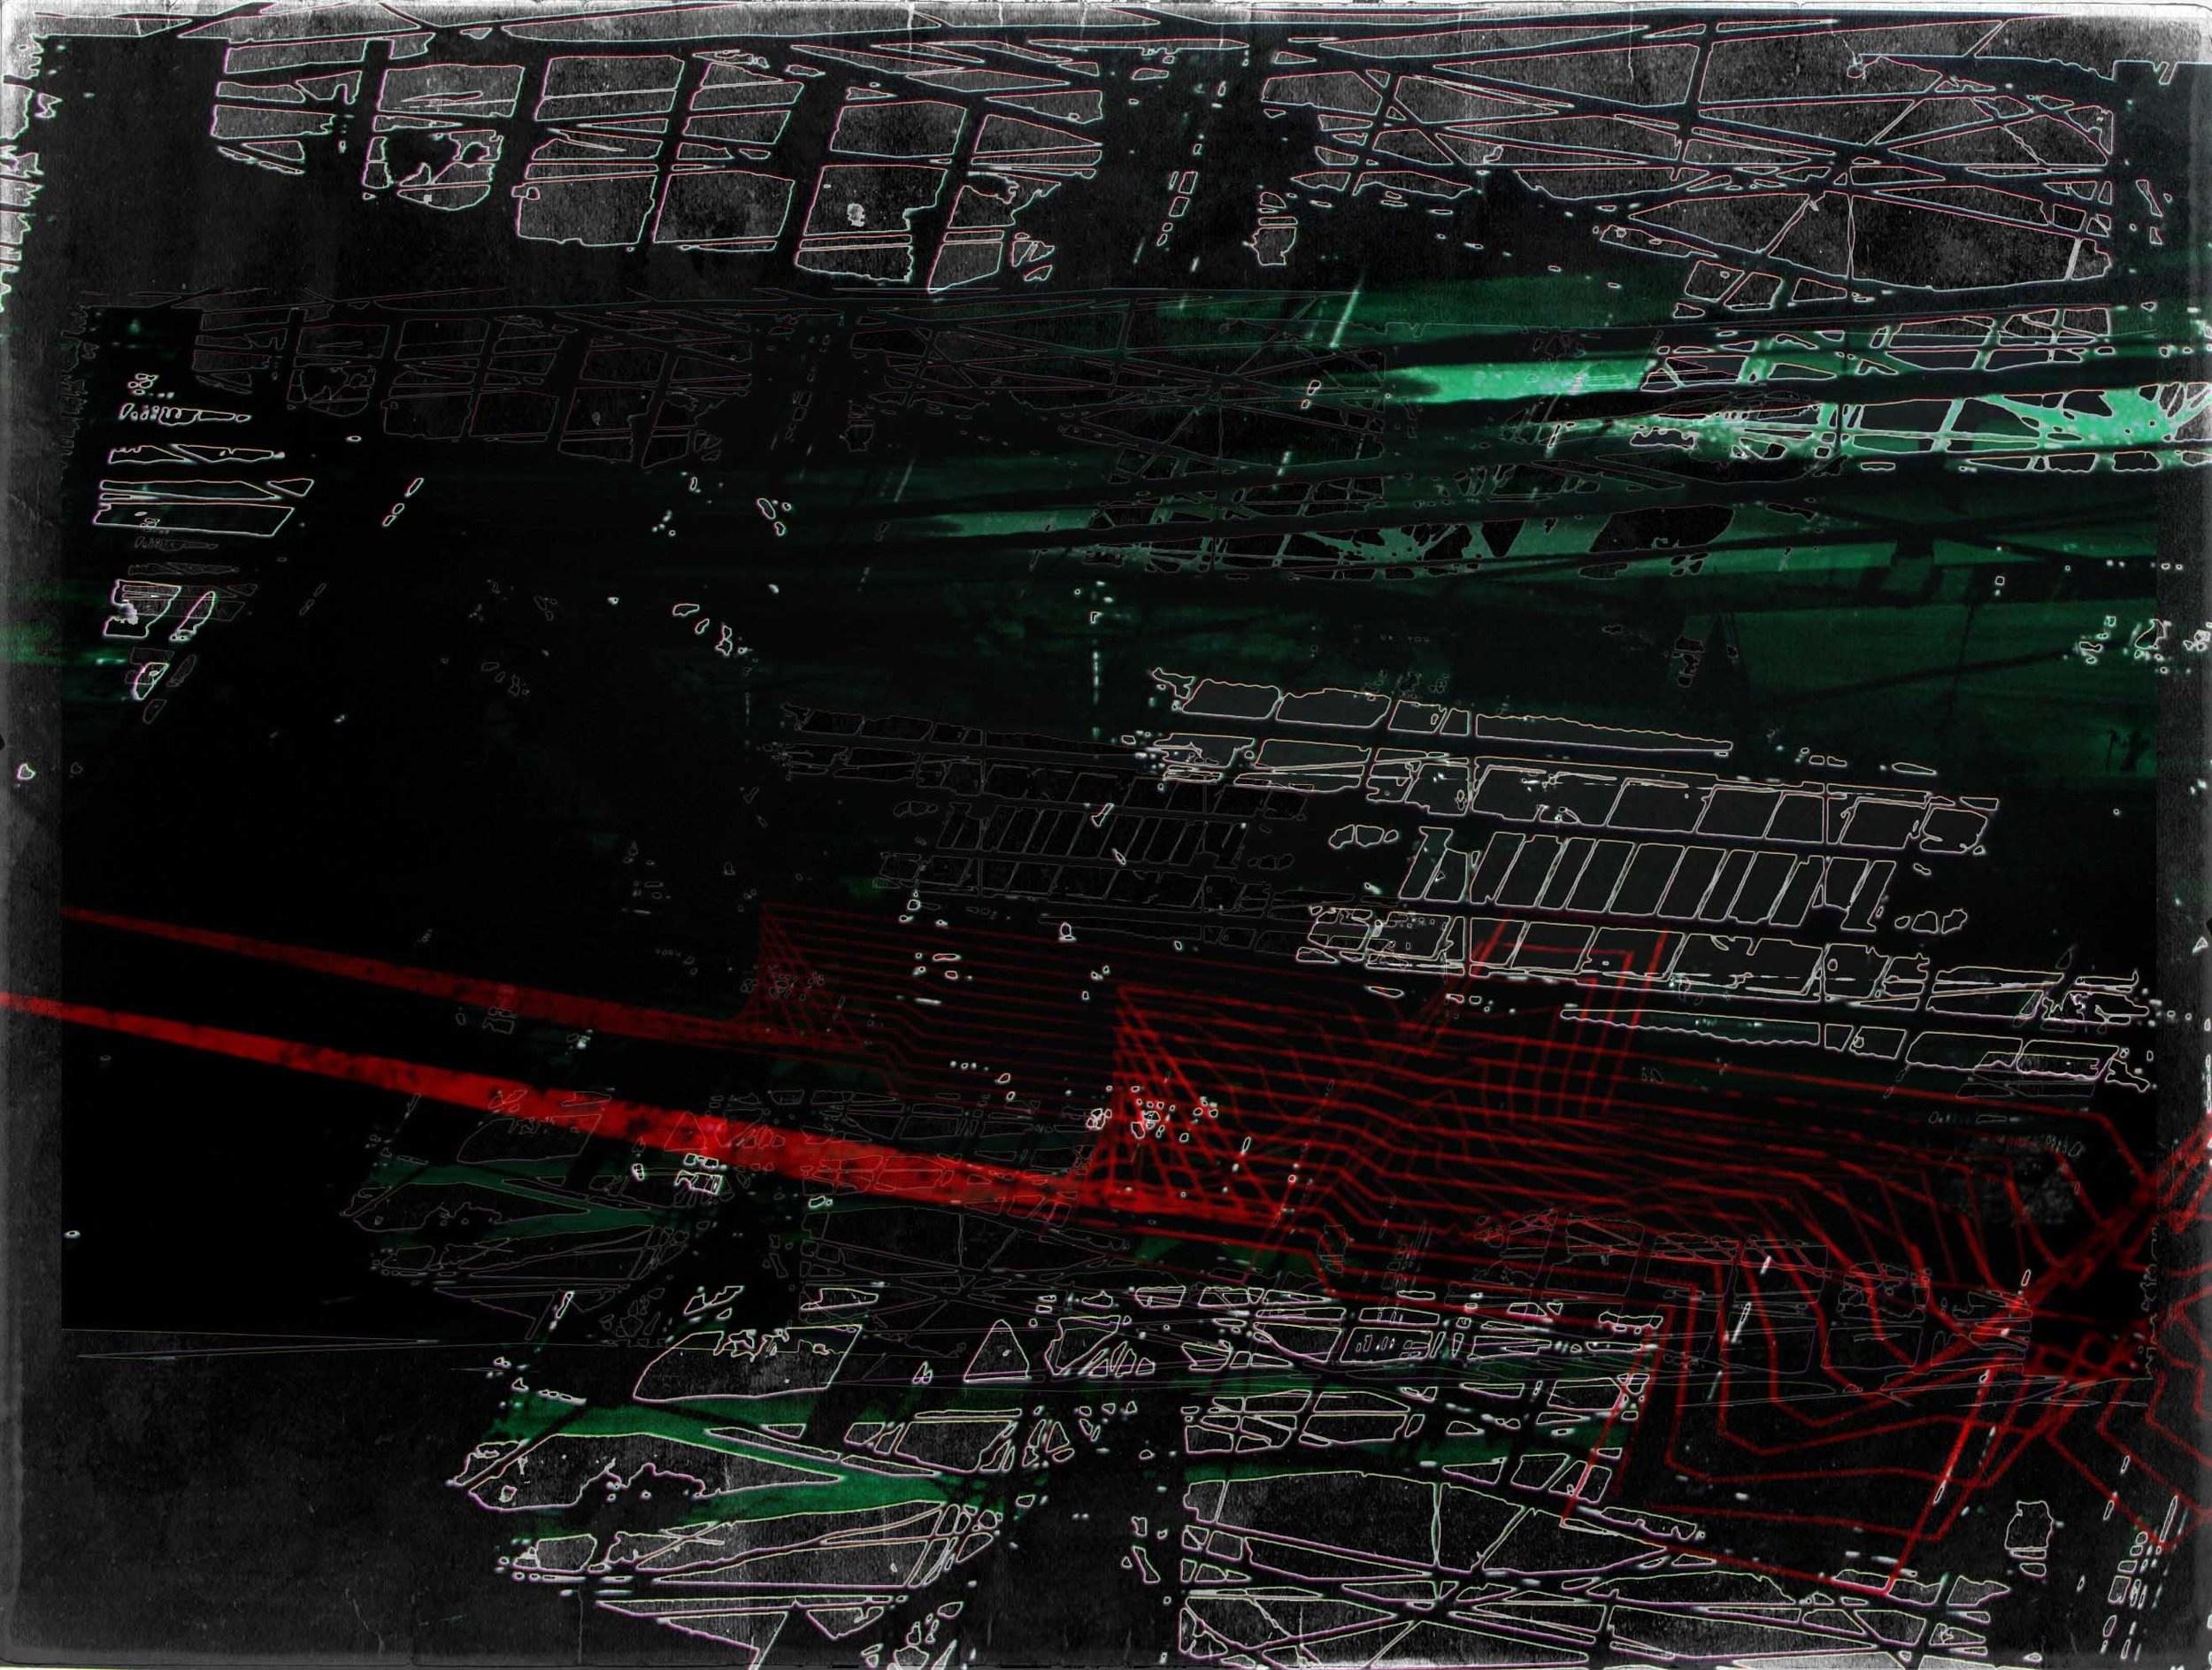 keleloko_City congestion screenprint 01a.jpg